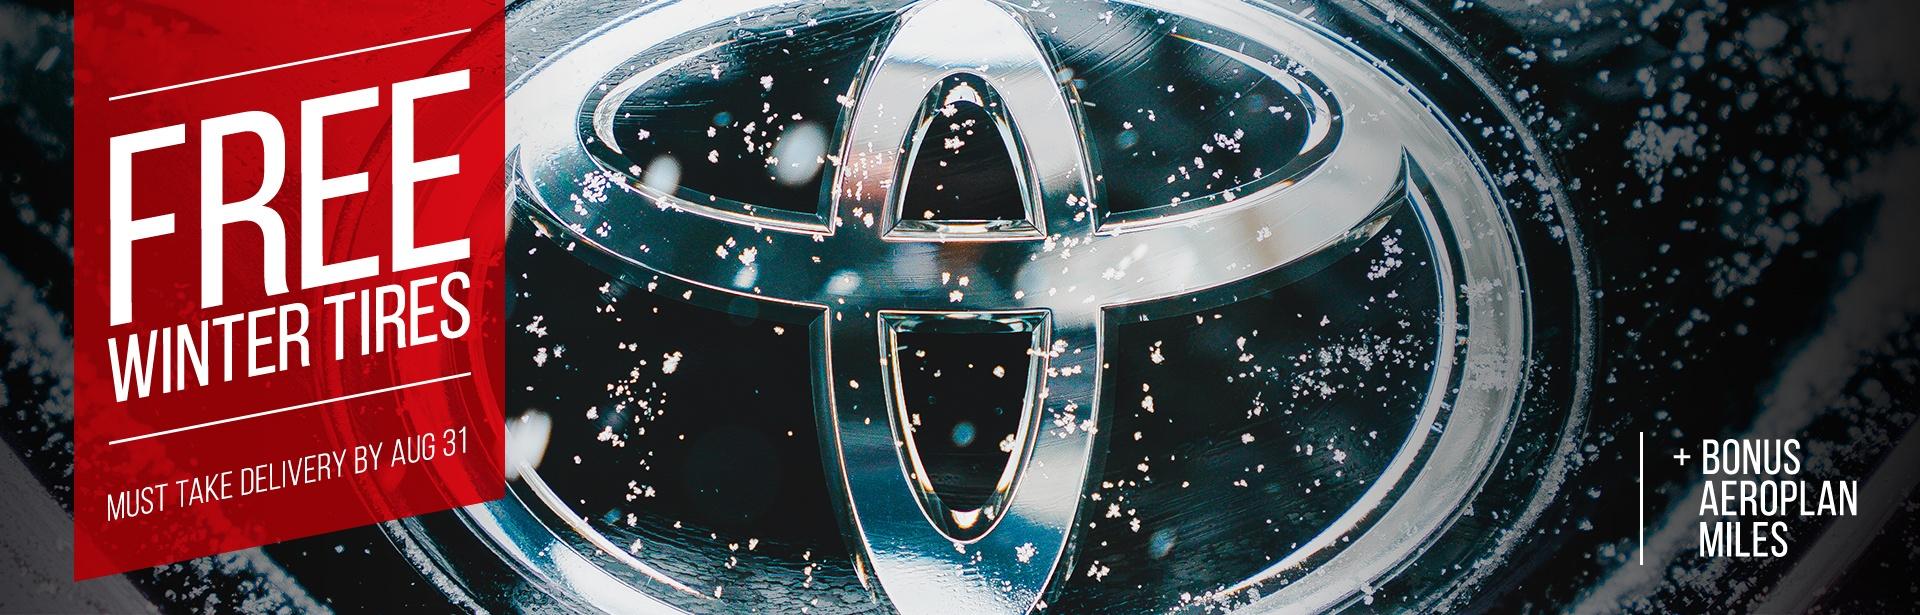 13490-TAG-Flash-Sale_Winter-Tires-1920x615-1